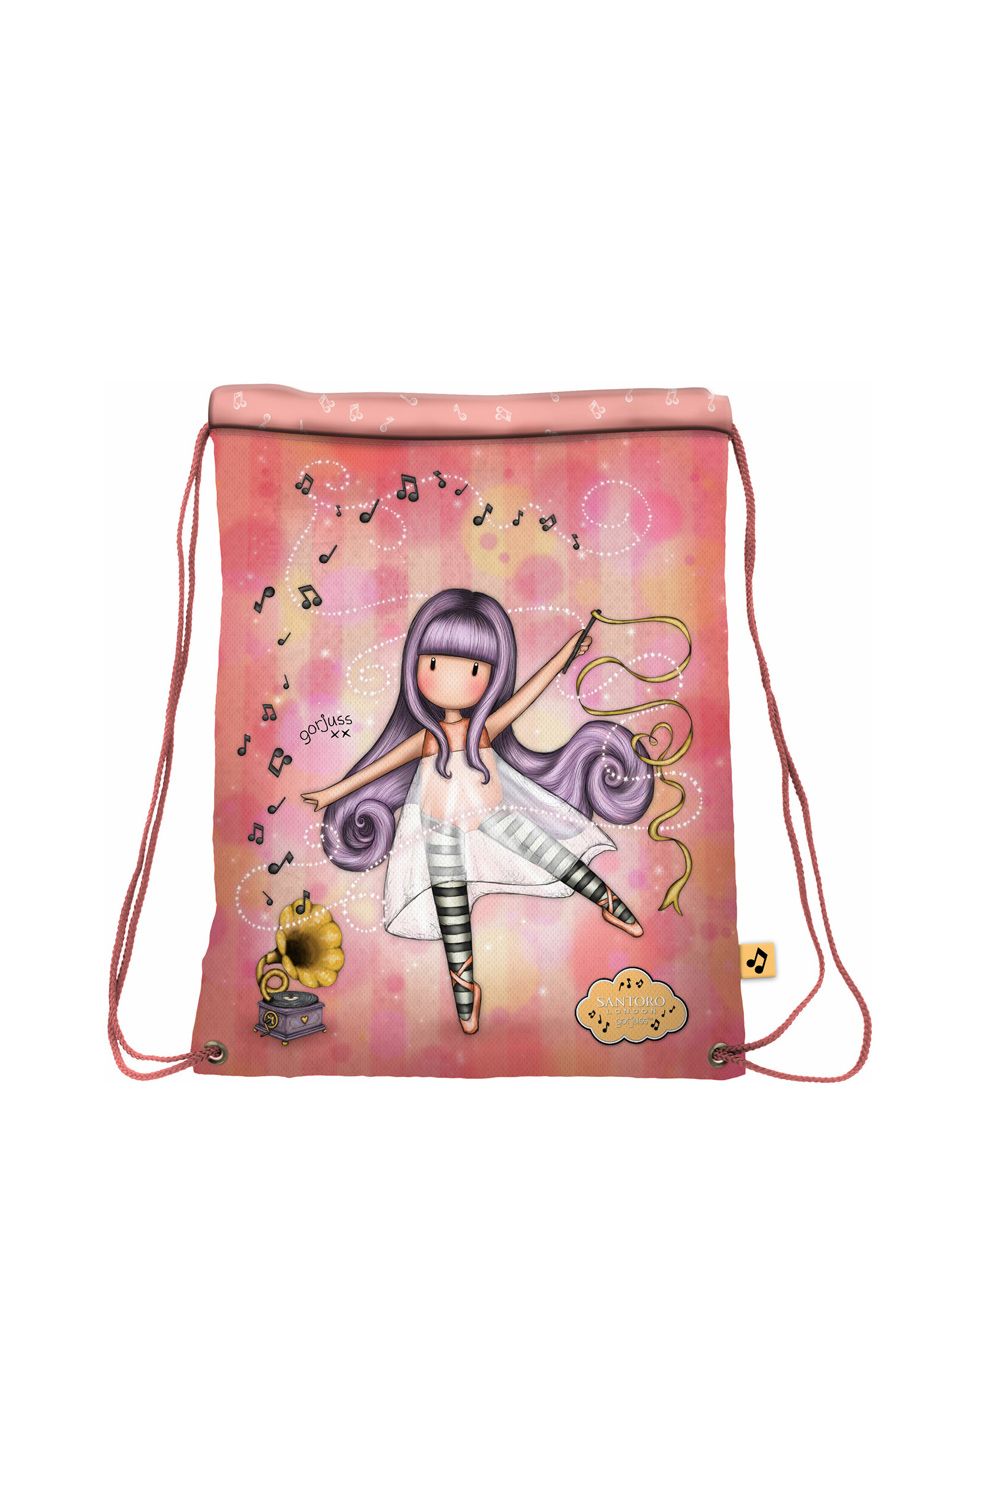 Santoro сьомгова тип мешка чанта Gorjuss Little Dancer